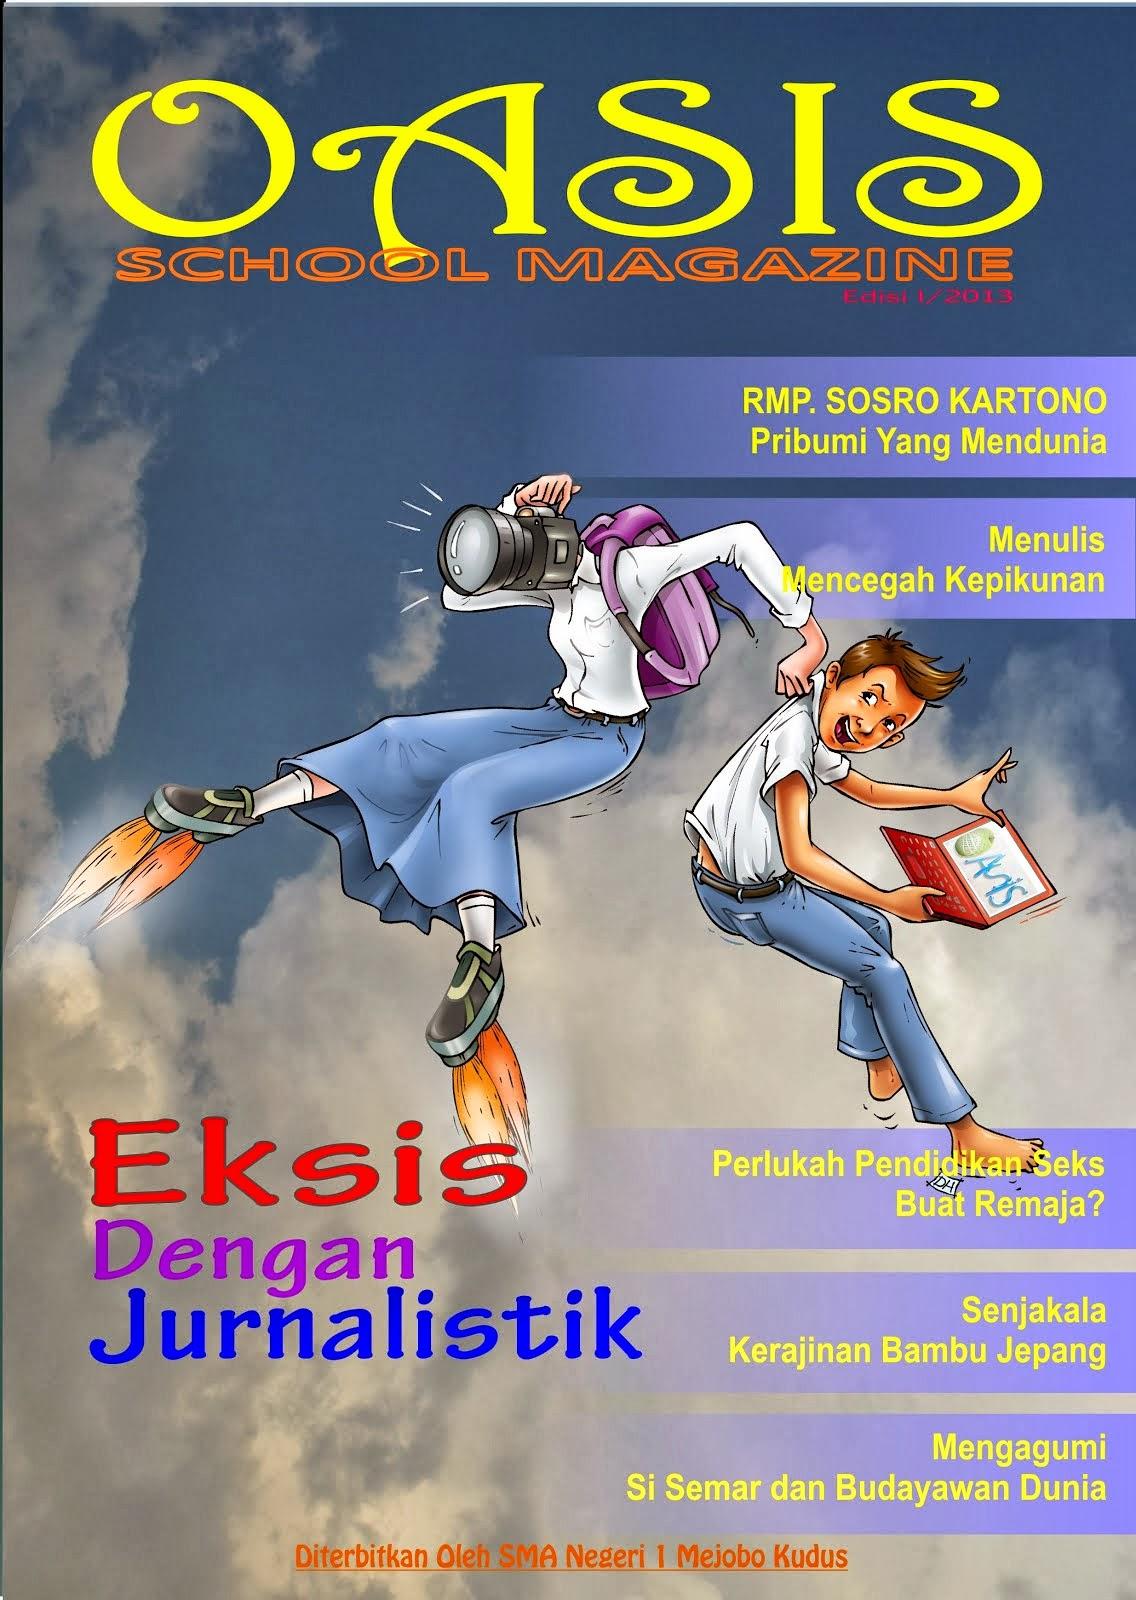 OASIS SCHOOL MAGAZINE